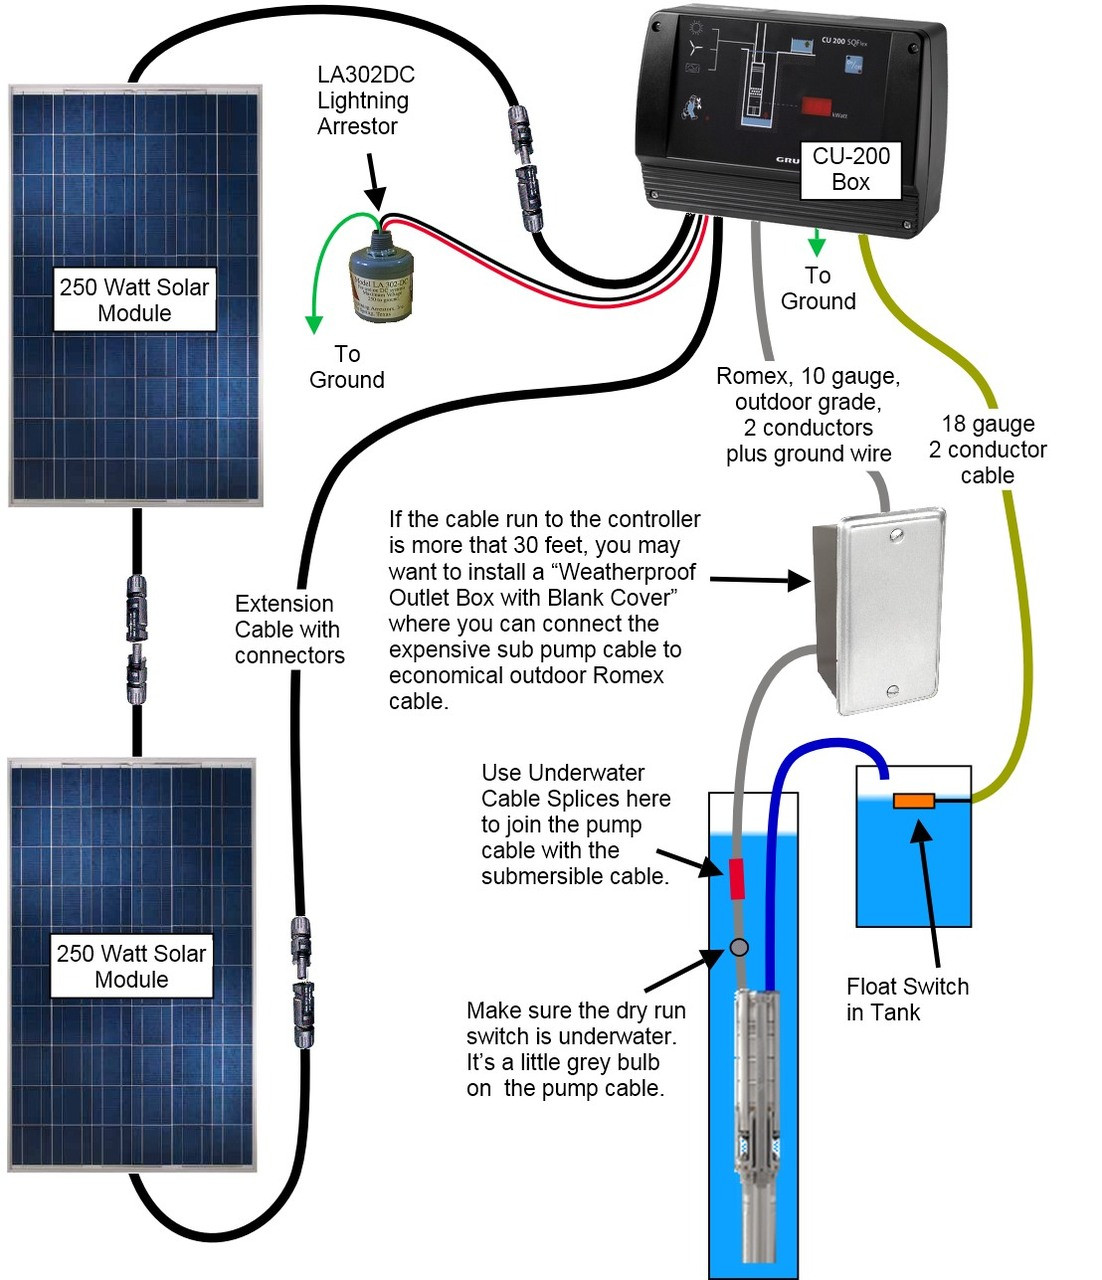 Grundfos Solar Panel Wiring Diagram Blogs House Sqflex 40sqf 3 4 Centrifugal Well Pump Home Power